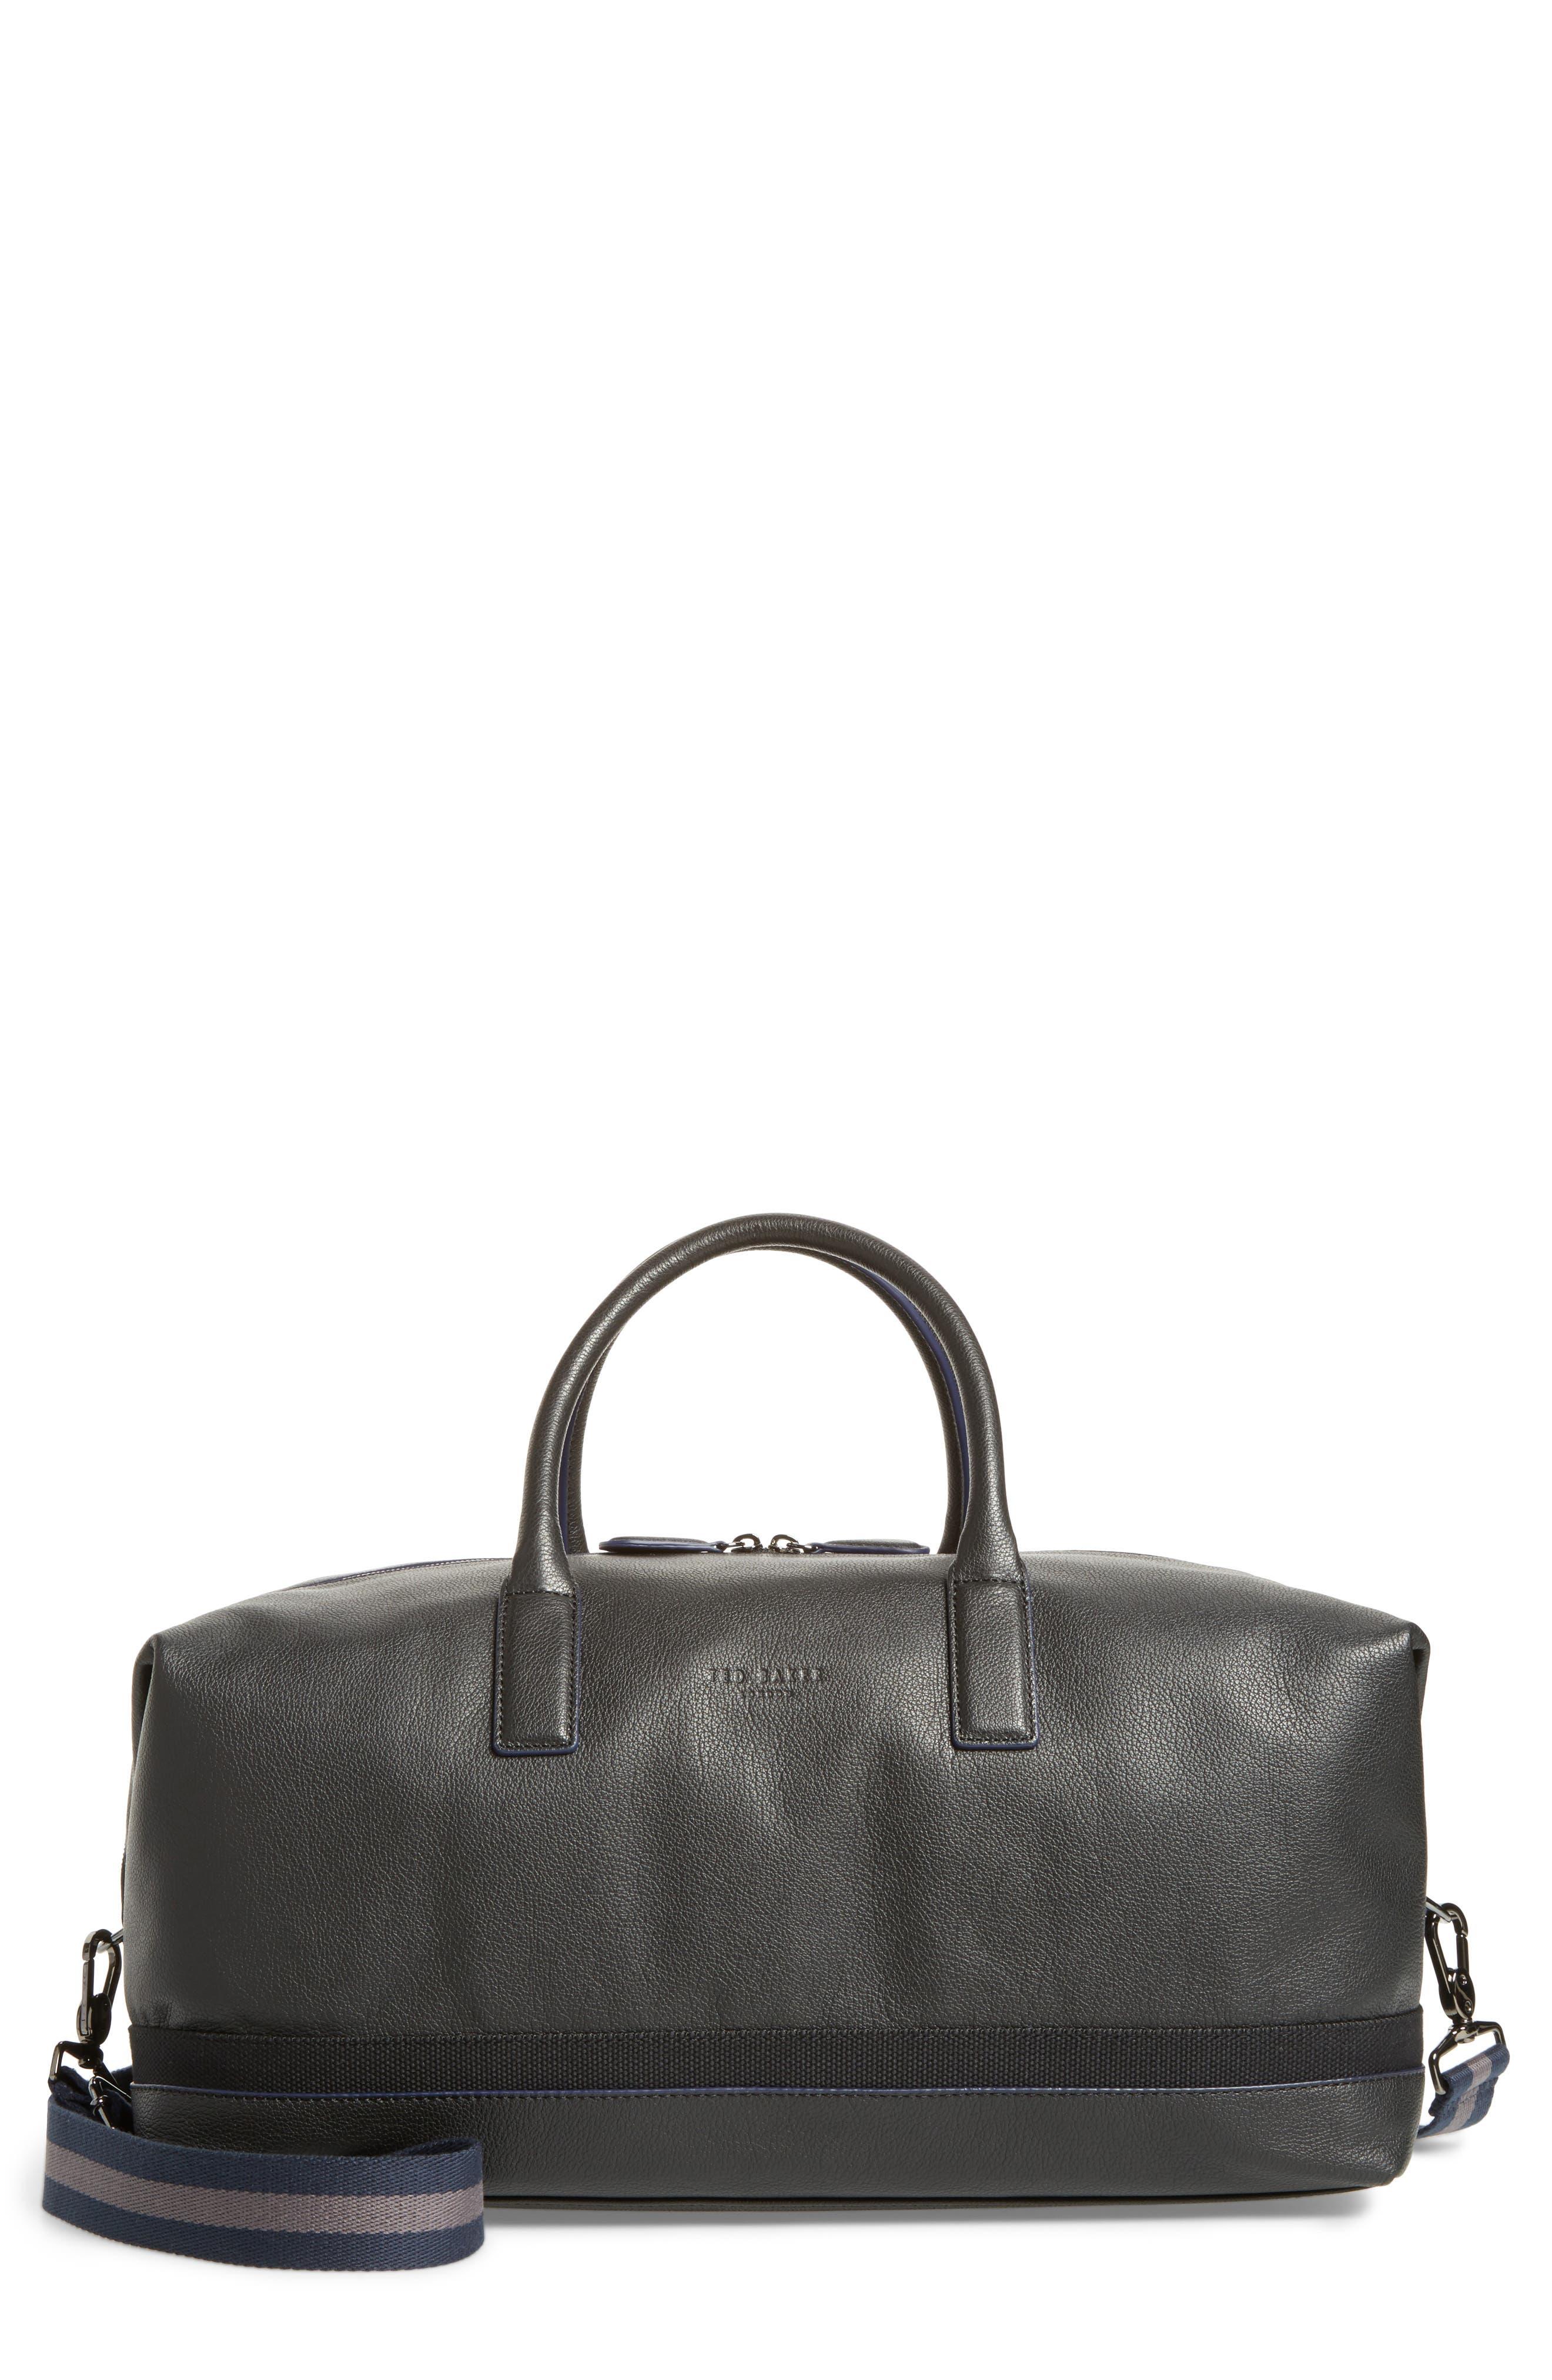 a92b4bc83f Ted Baker Mylow Duffel Bag - Black